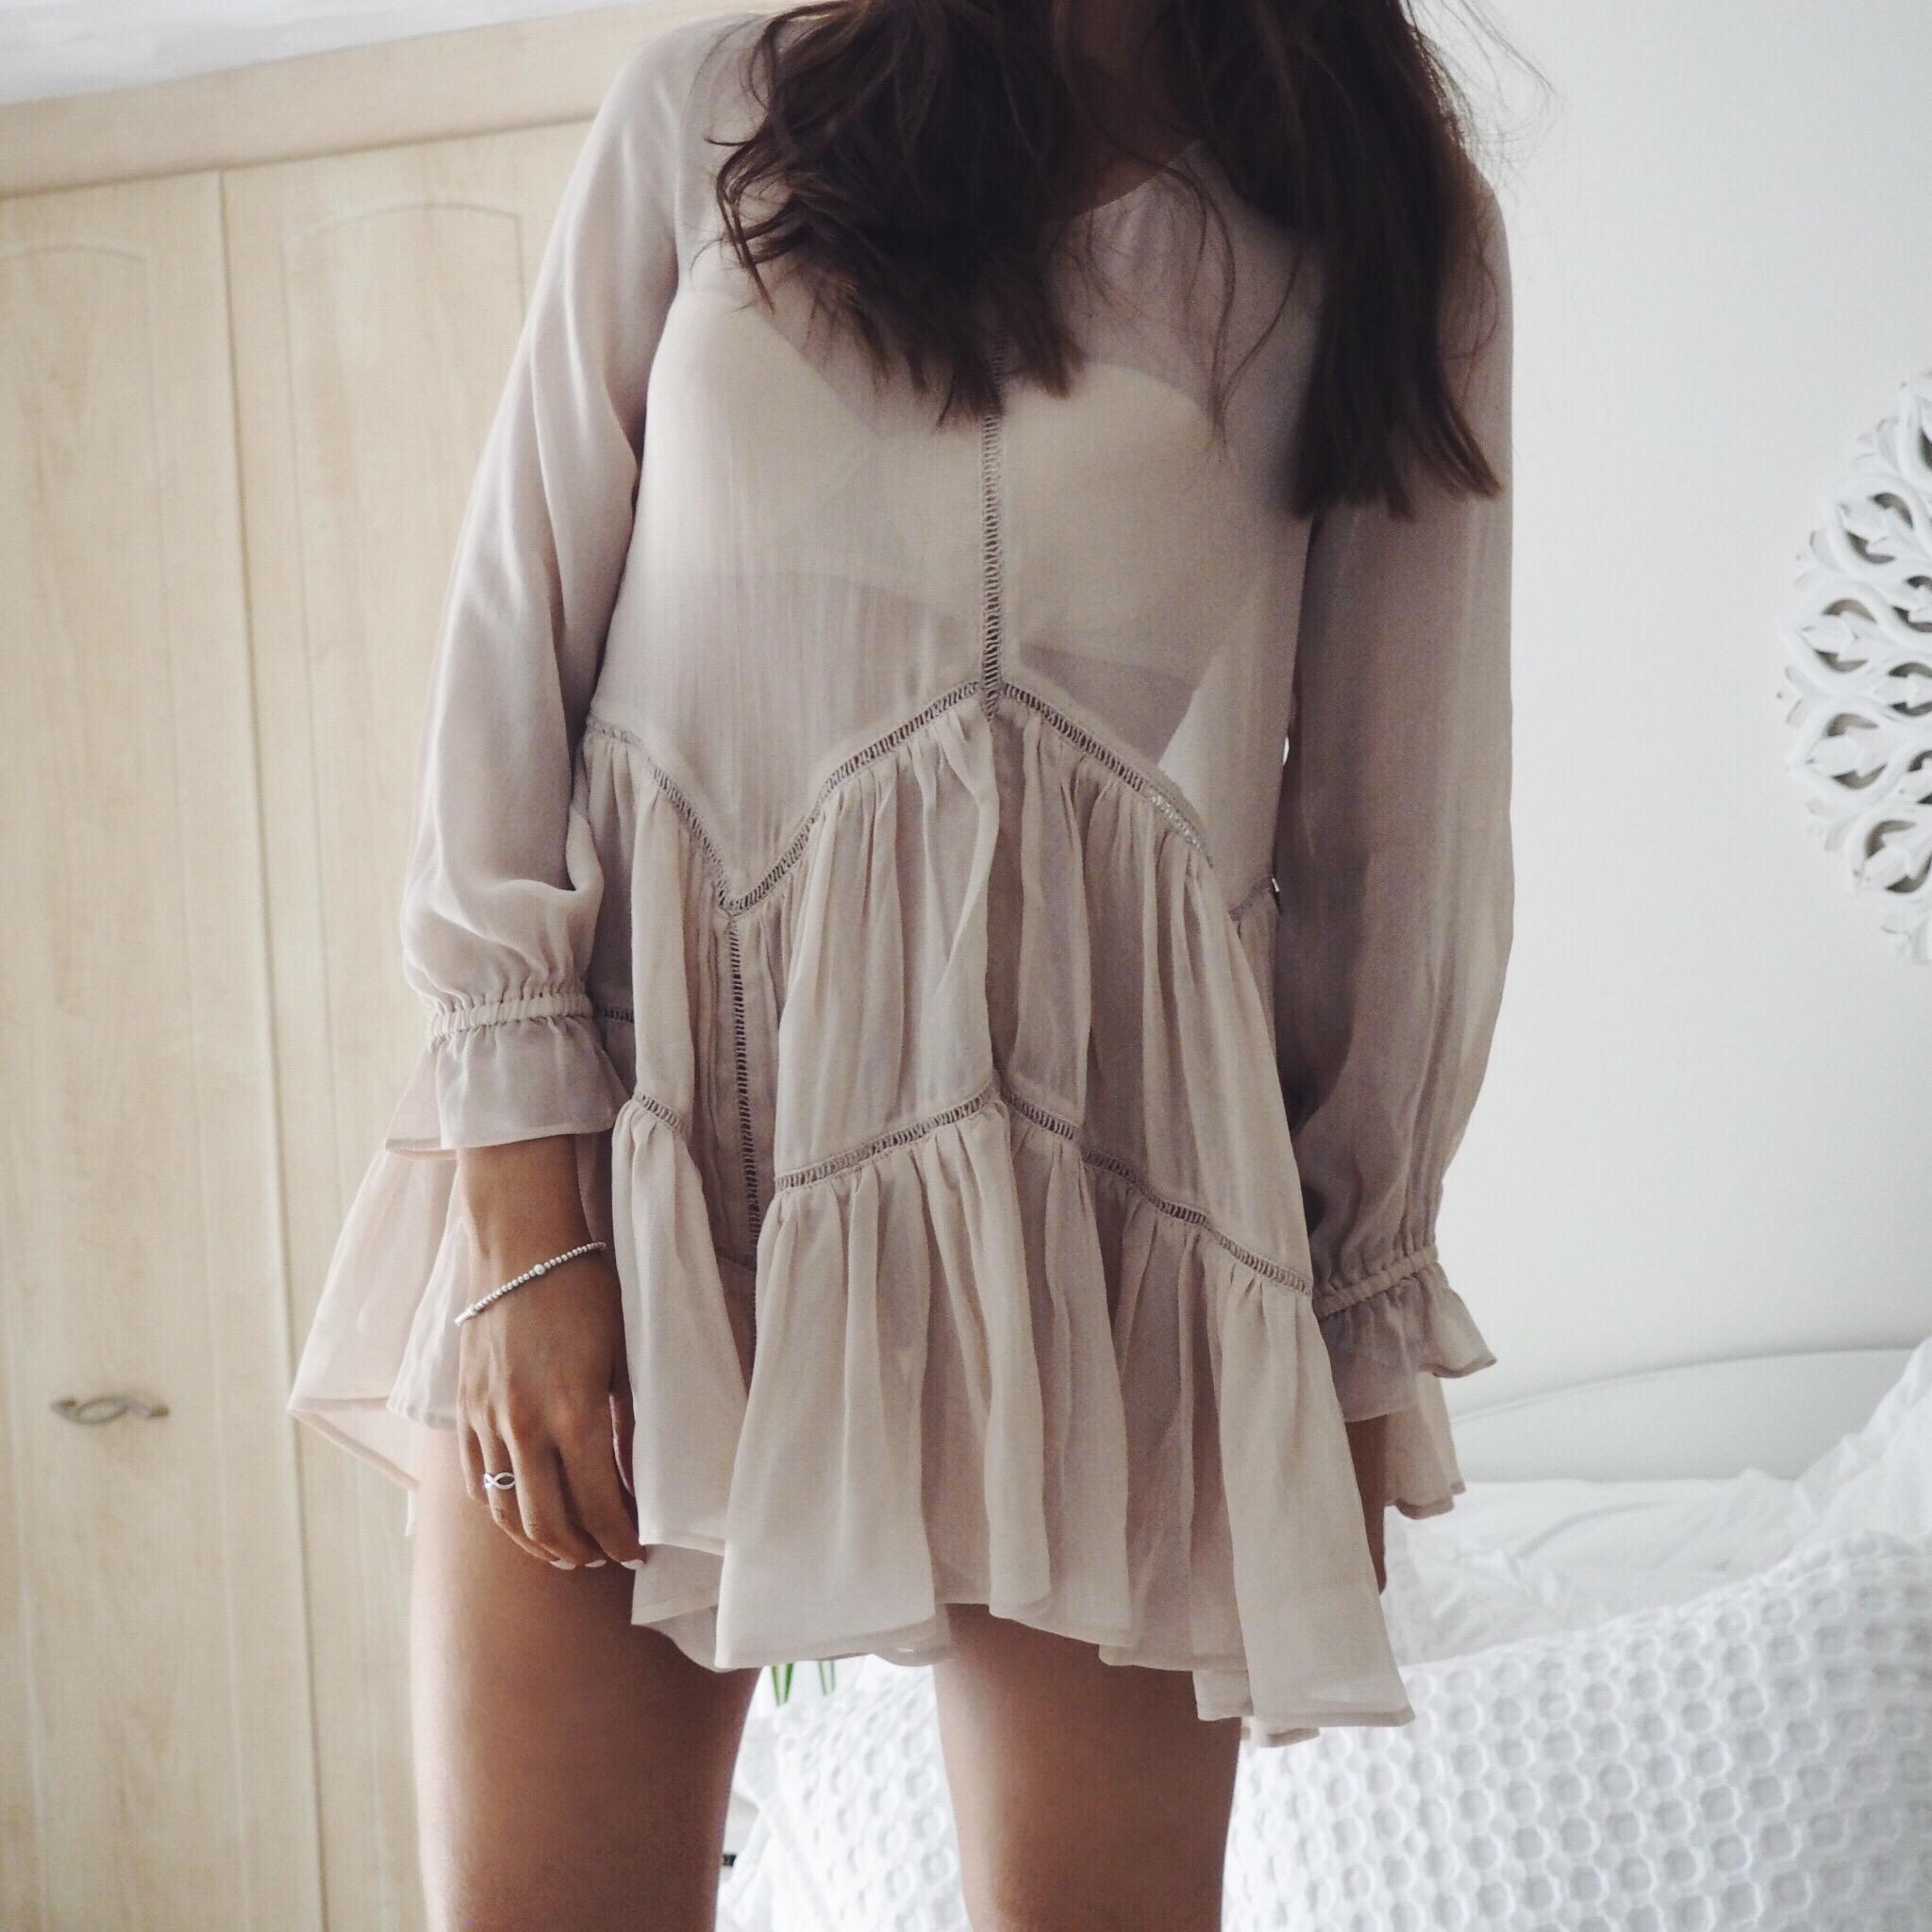 Fashion blogger wearing ruffle hem swing dress